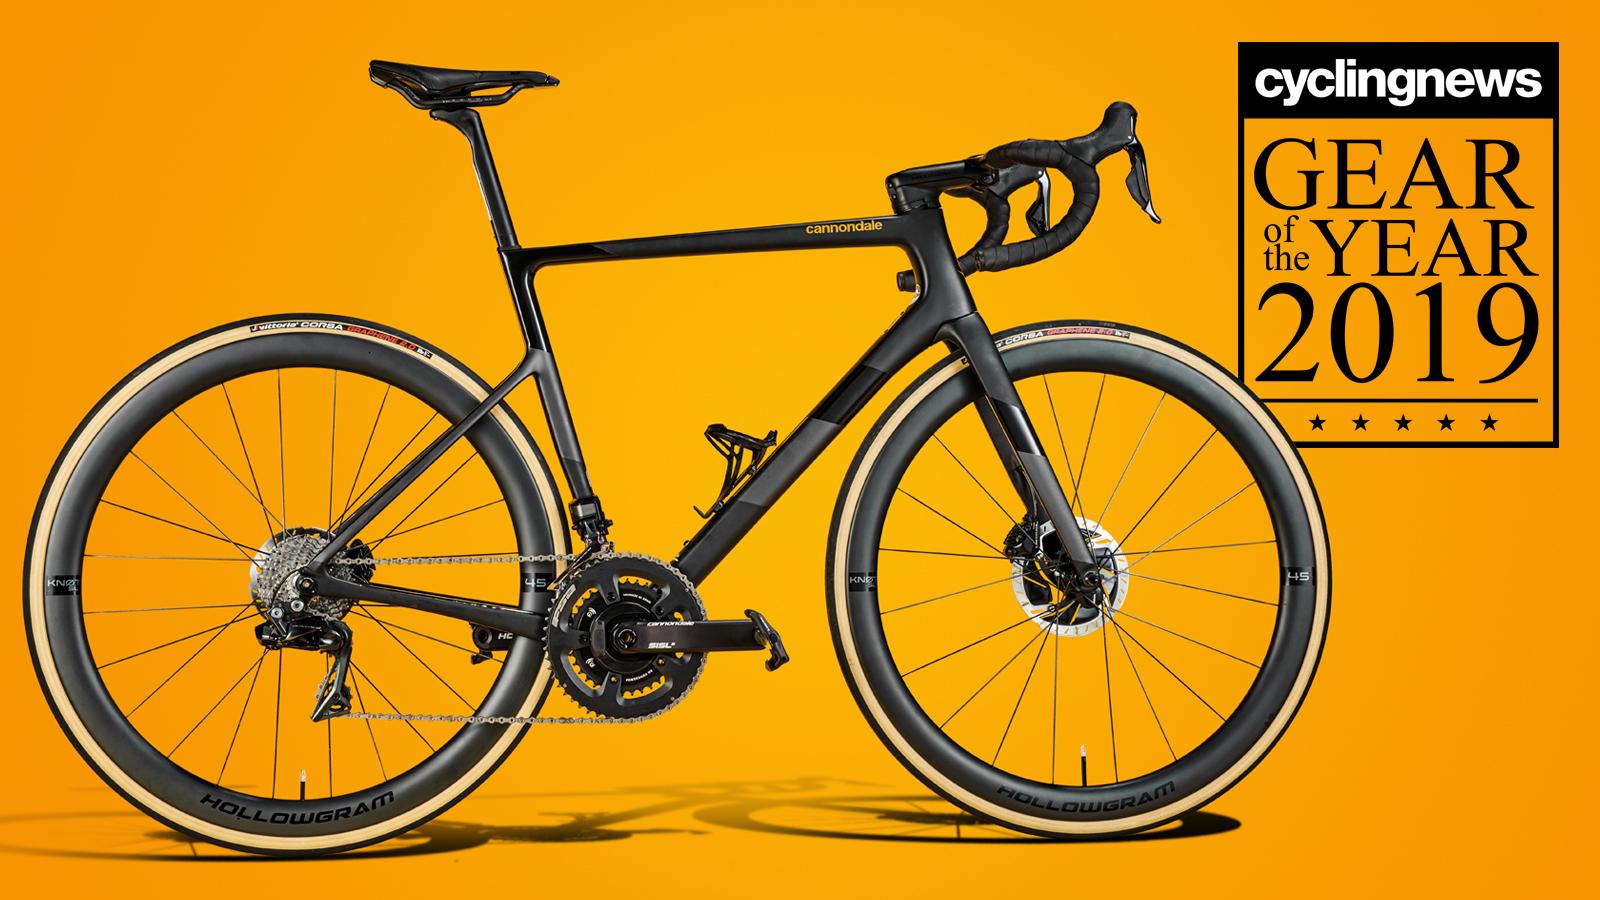 Giant Original Core MTB Mountain Bike Bicycle Pedal Black Red 1 pair